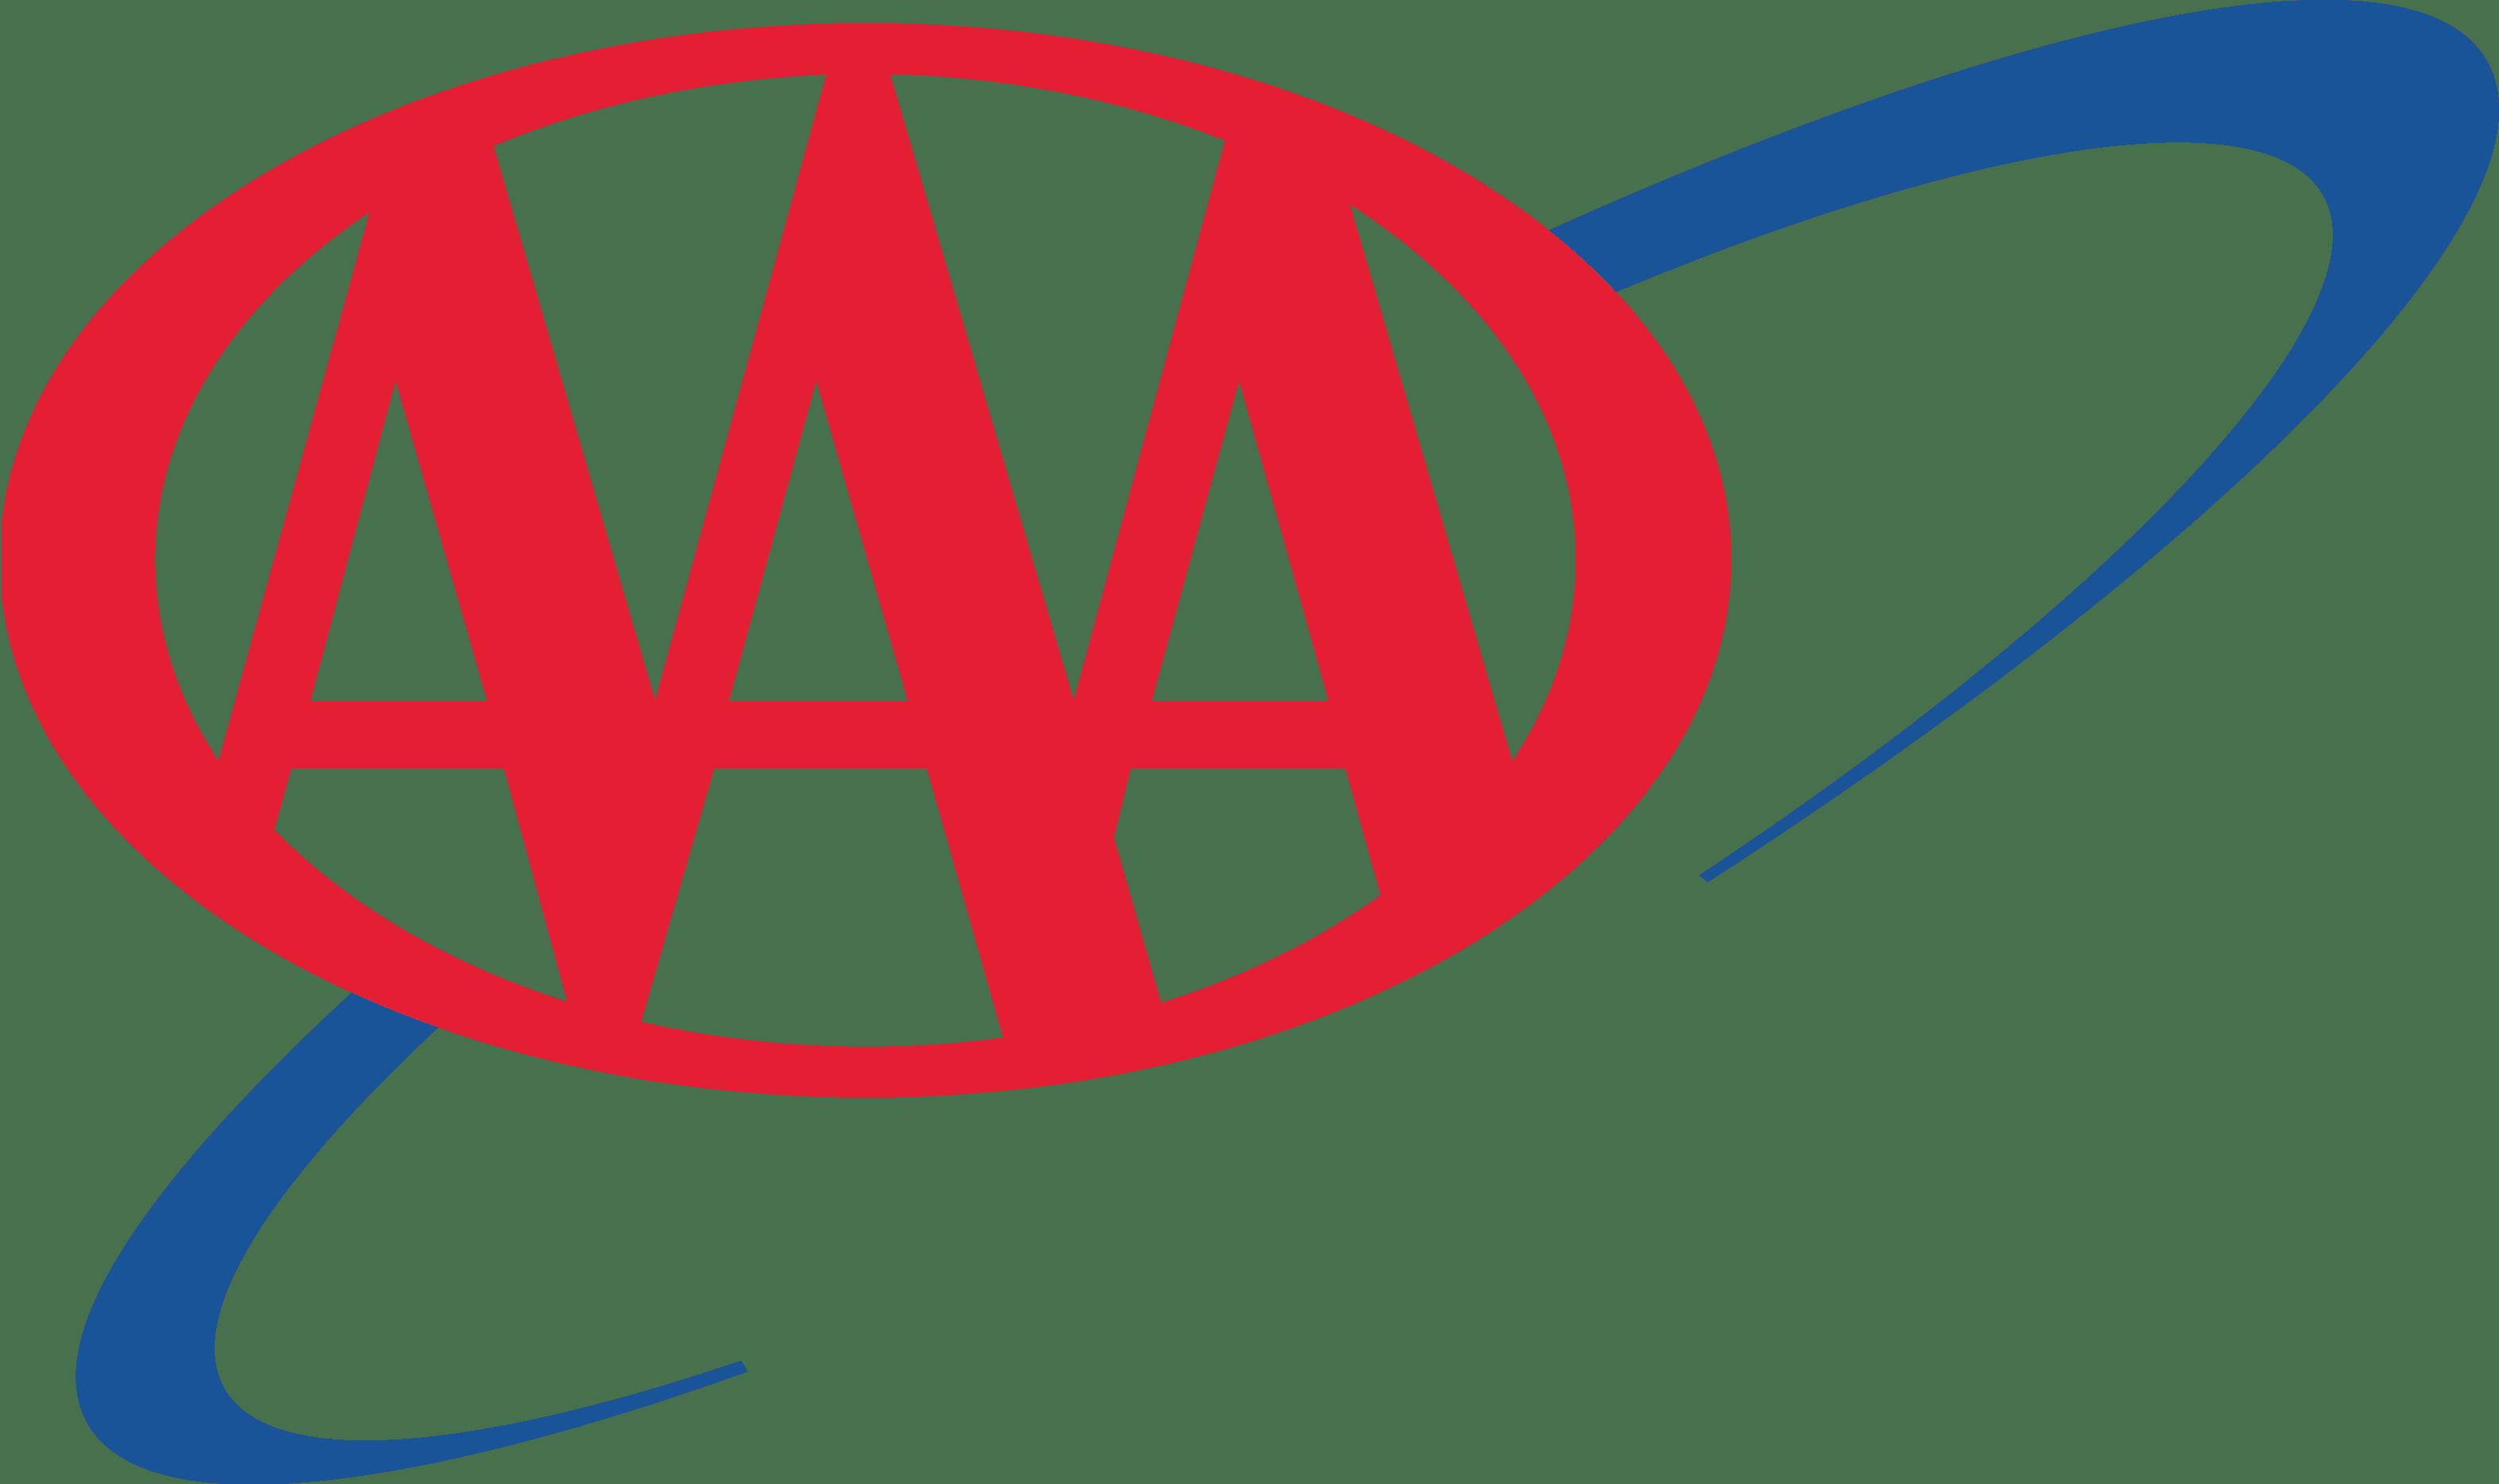 AAA Logo [American Automobile Association – EPS File] Vector EPS Free Download, Logo, Icons, Bra ...